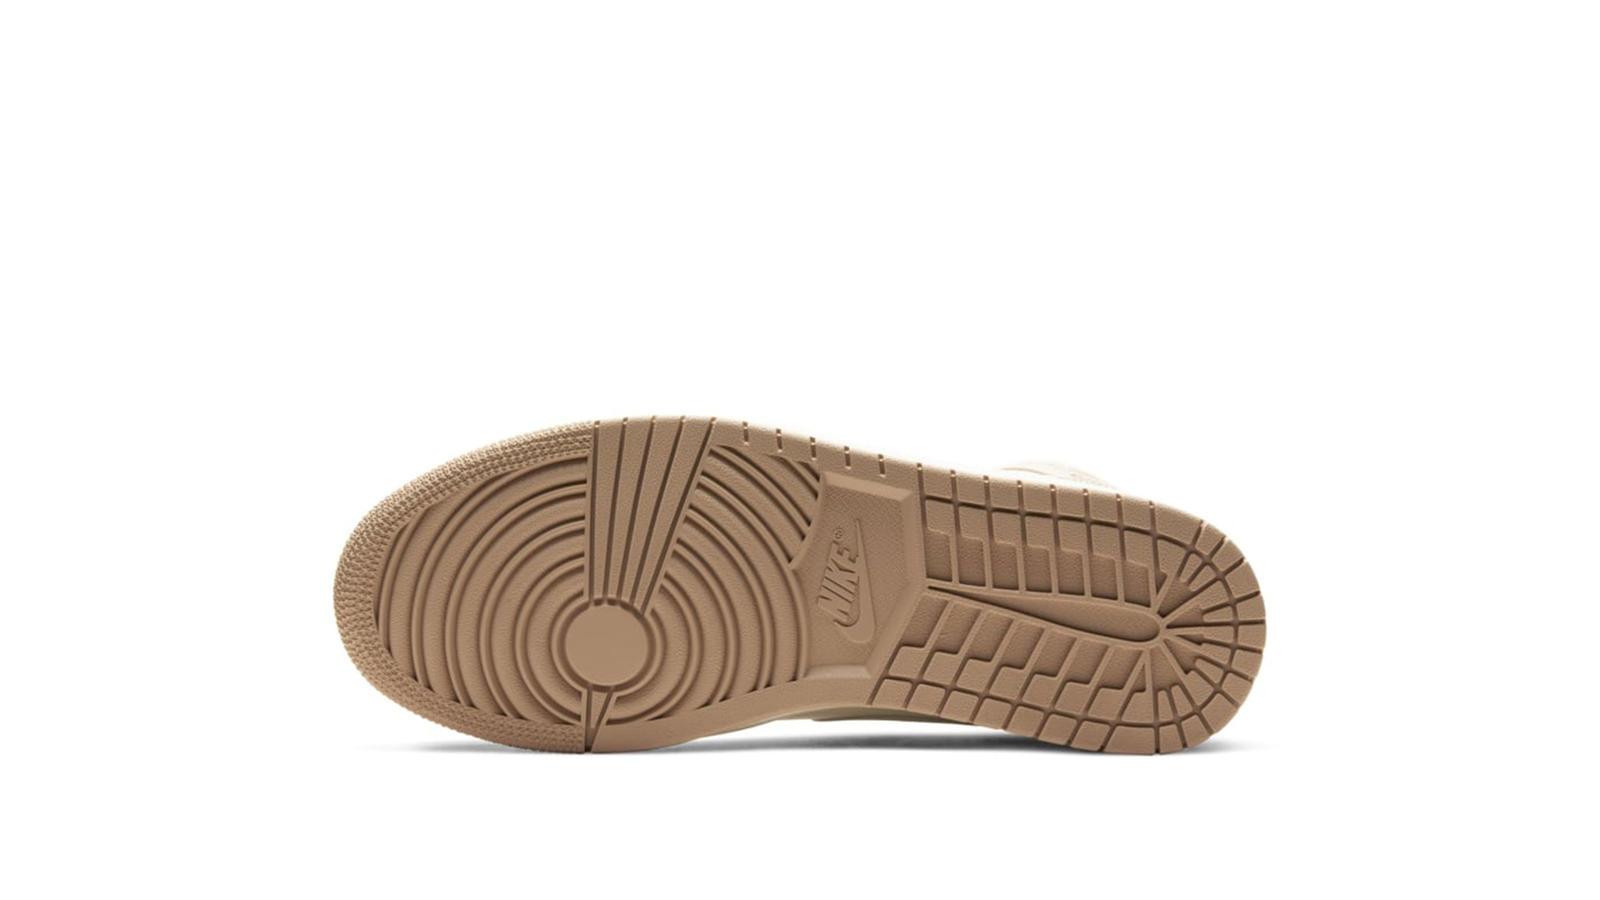 Jordan Proto Max 720 Nike News